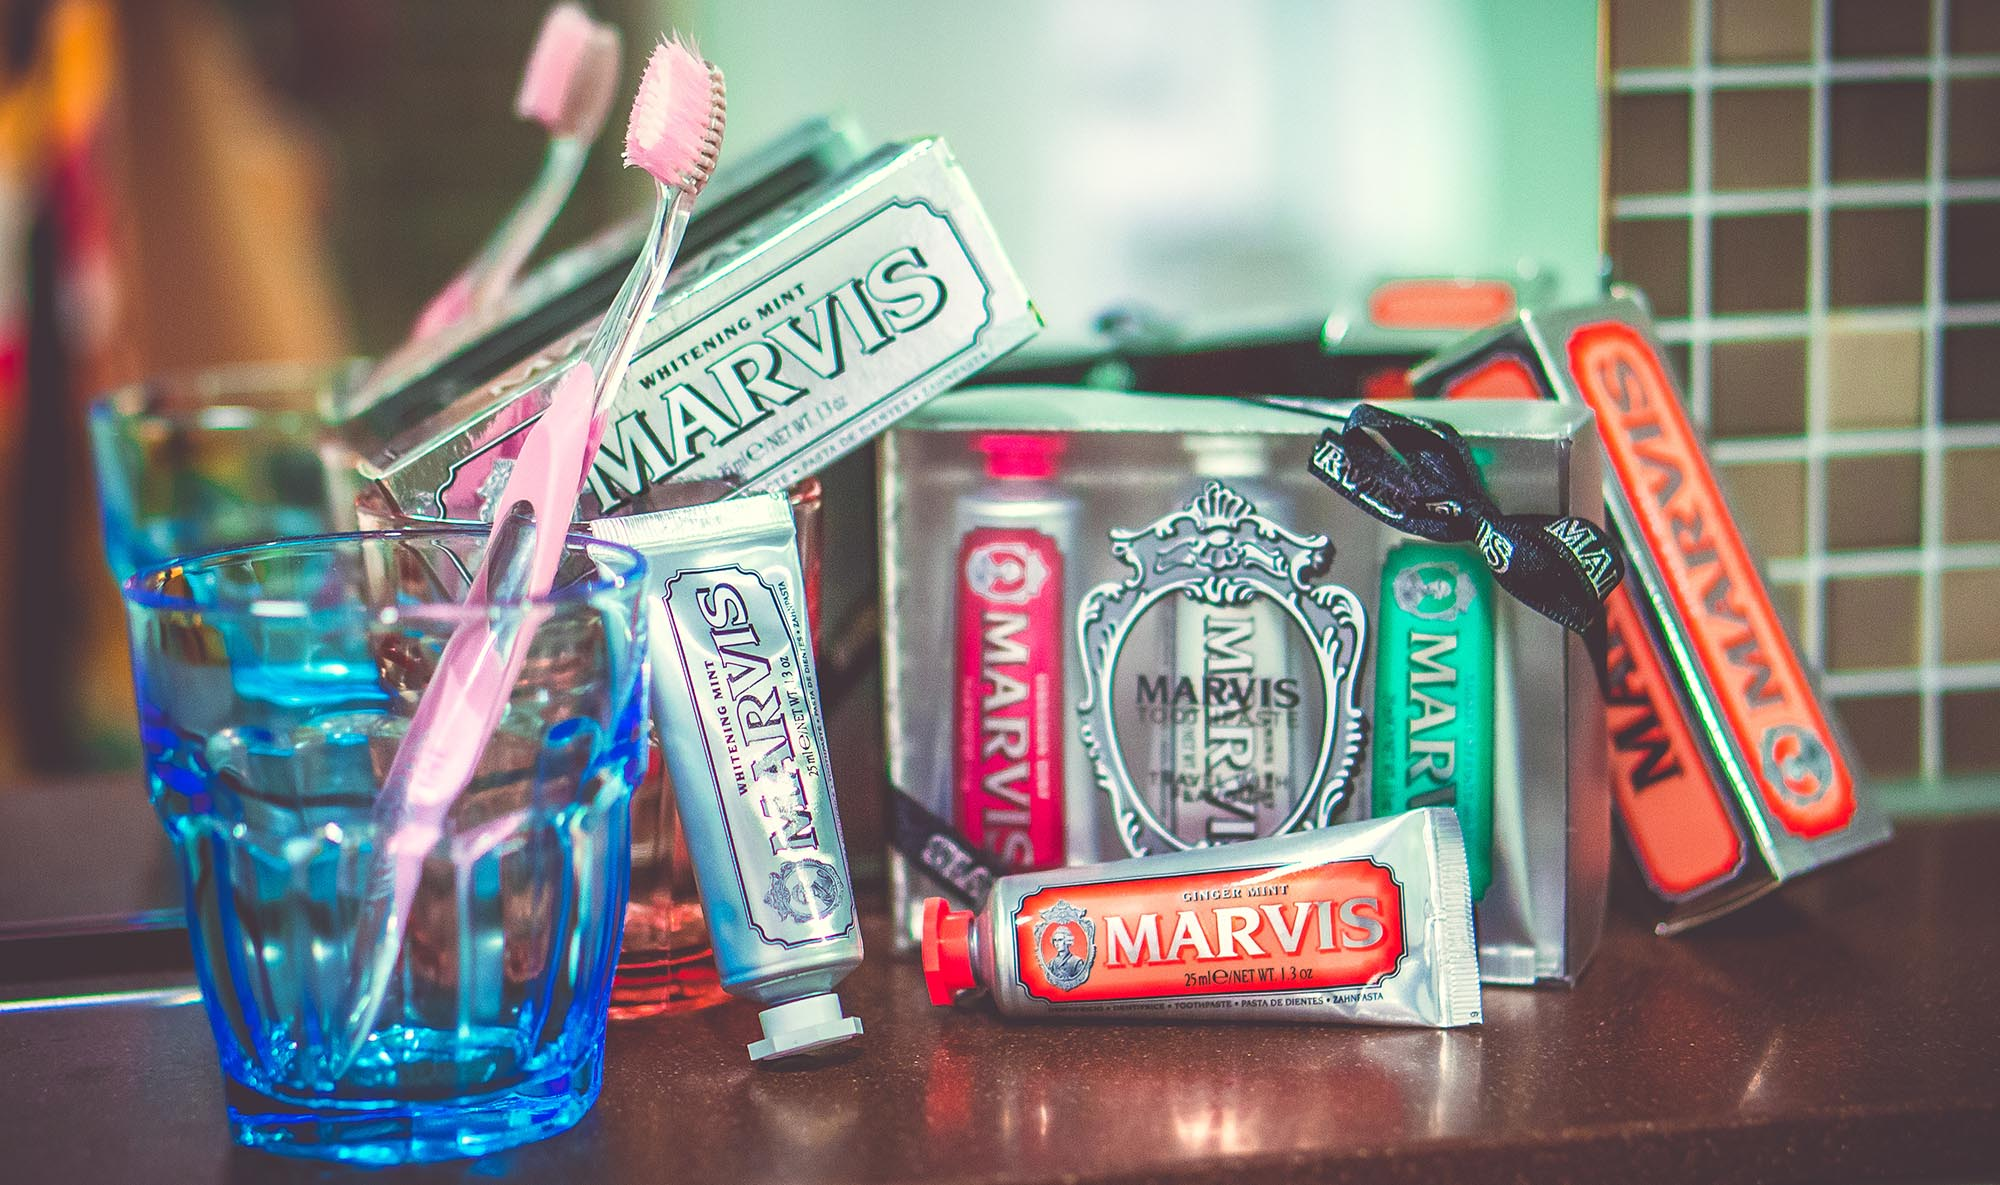 Marvis: хайп или крутые зубные пасты?